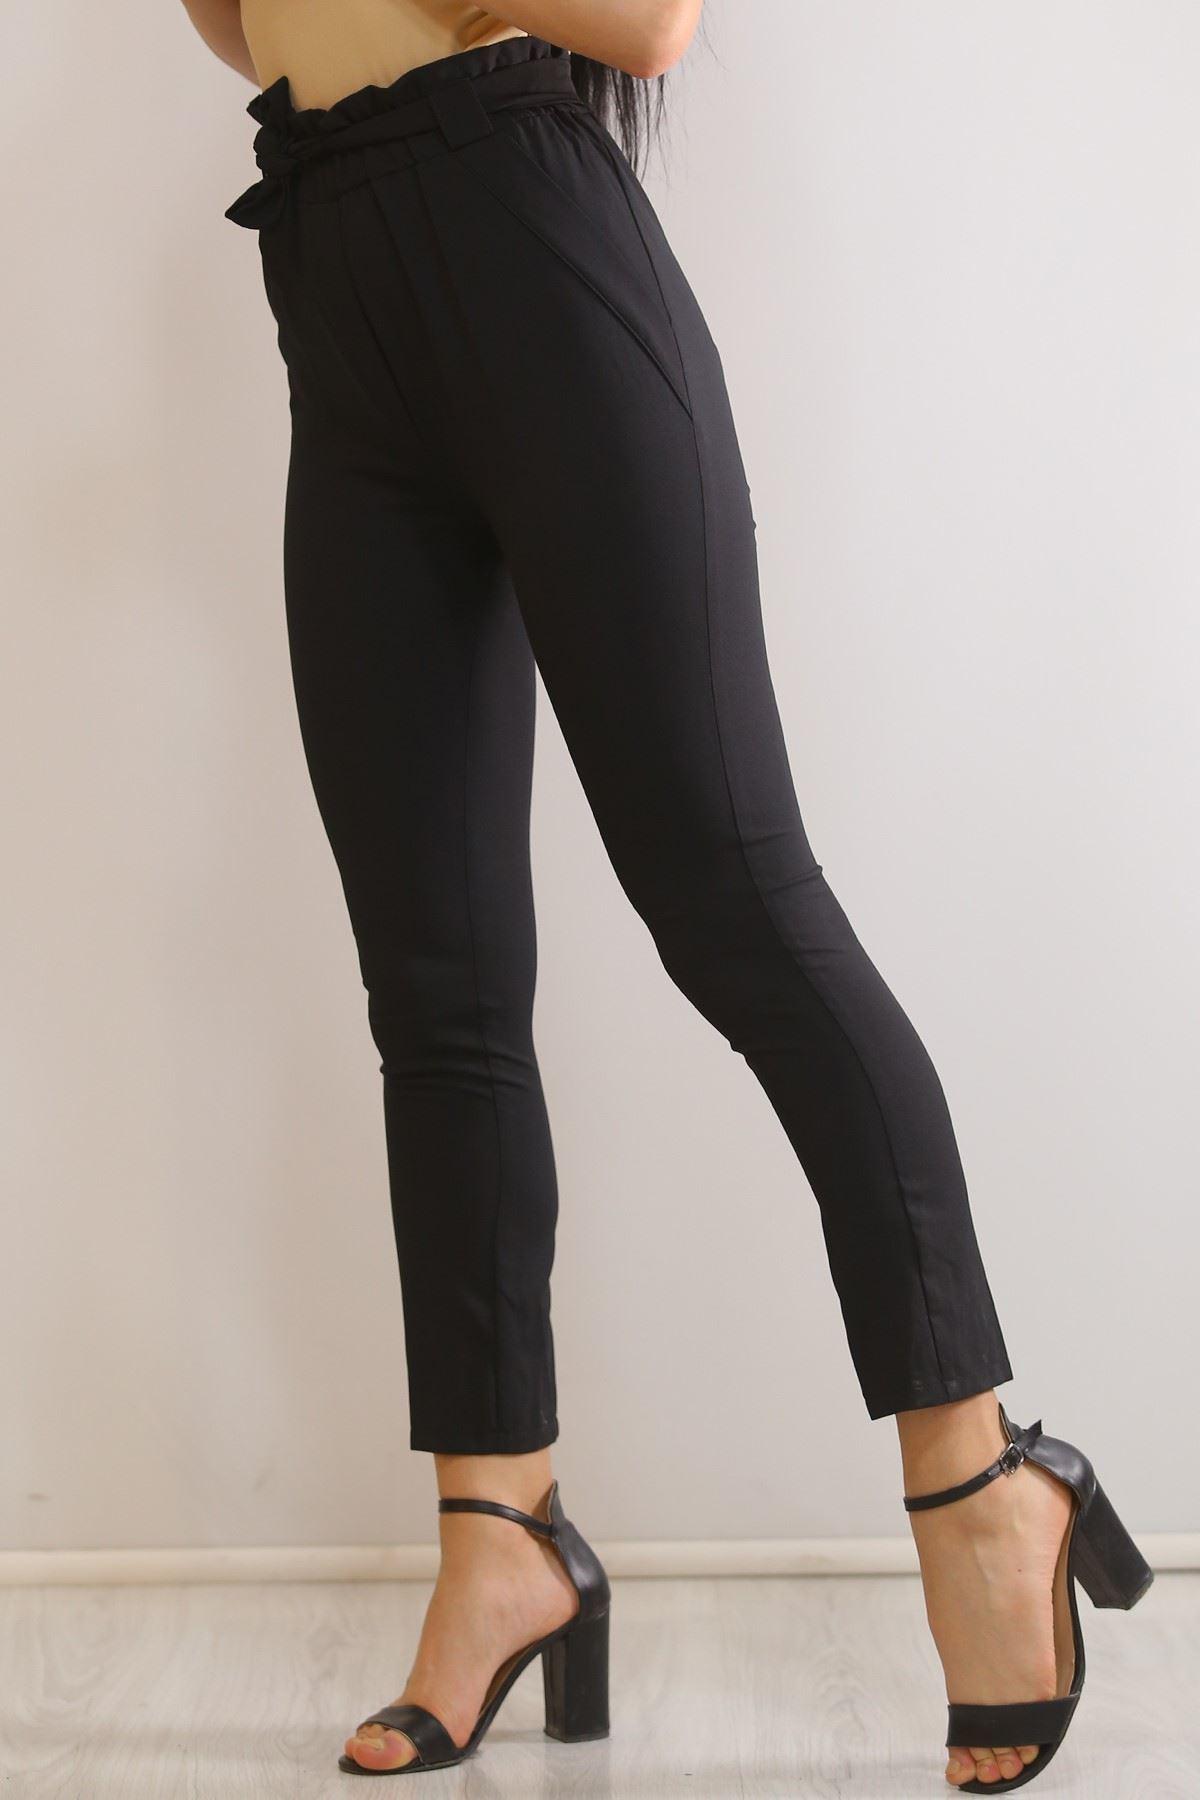 Kuşaklı Kumaş Pantolon Siyah - 5858.1247.